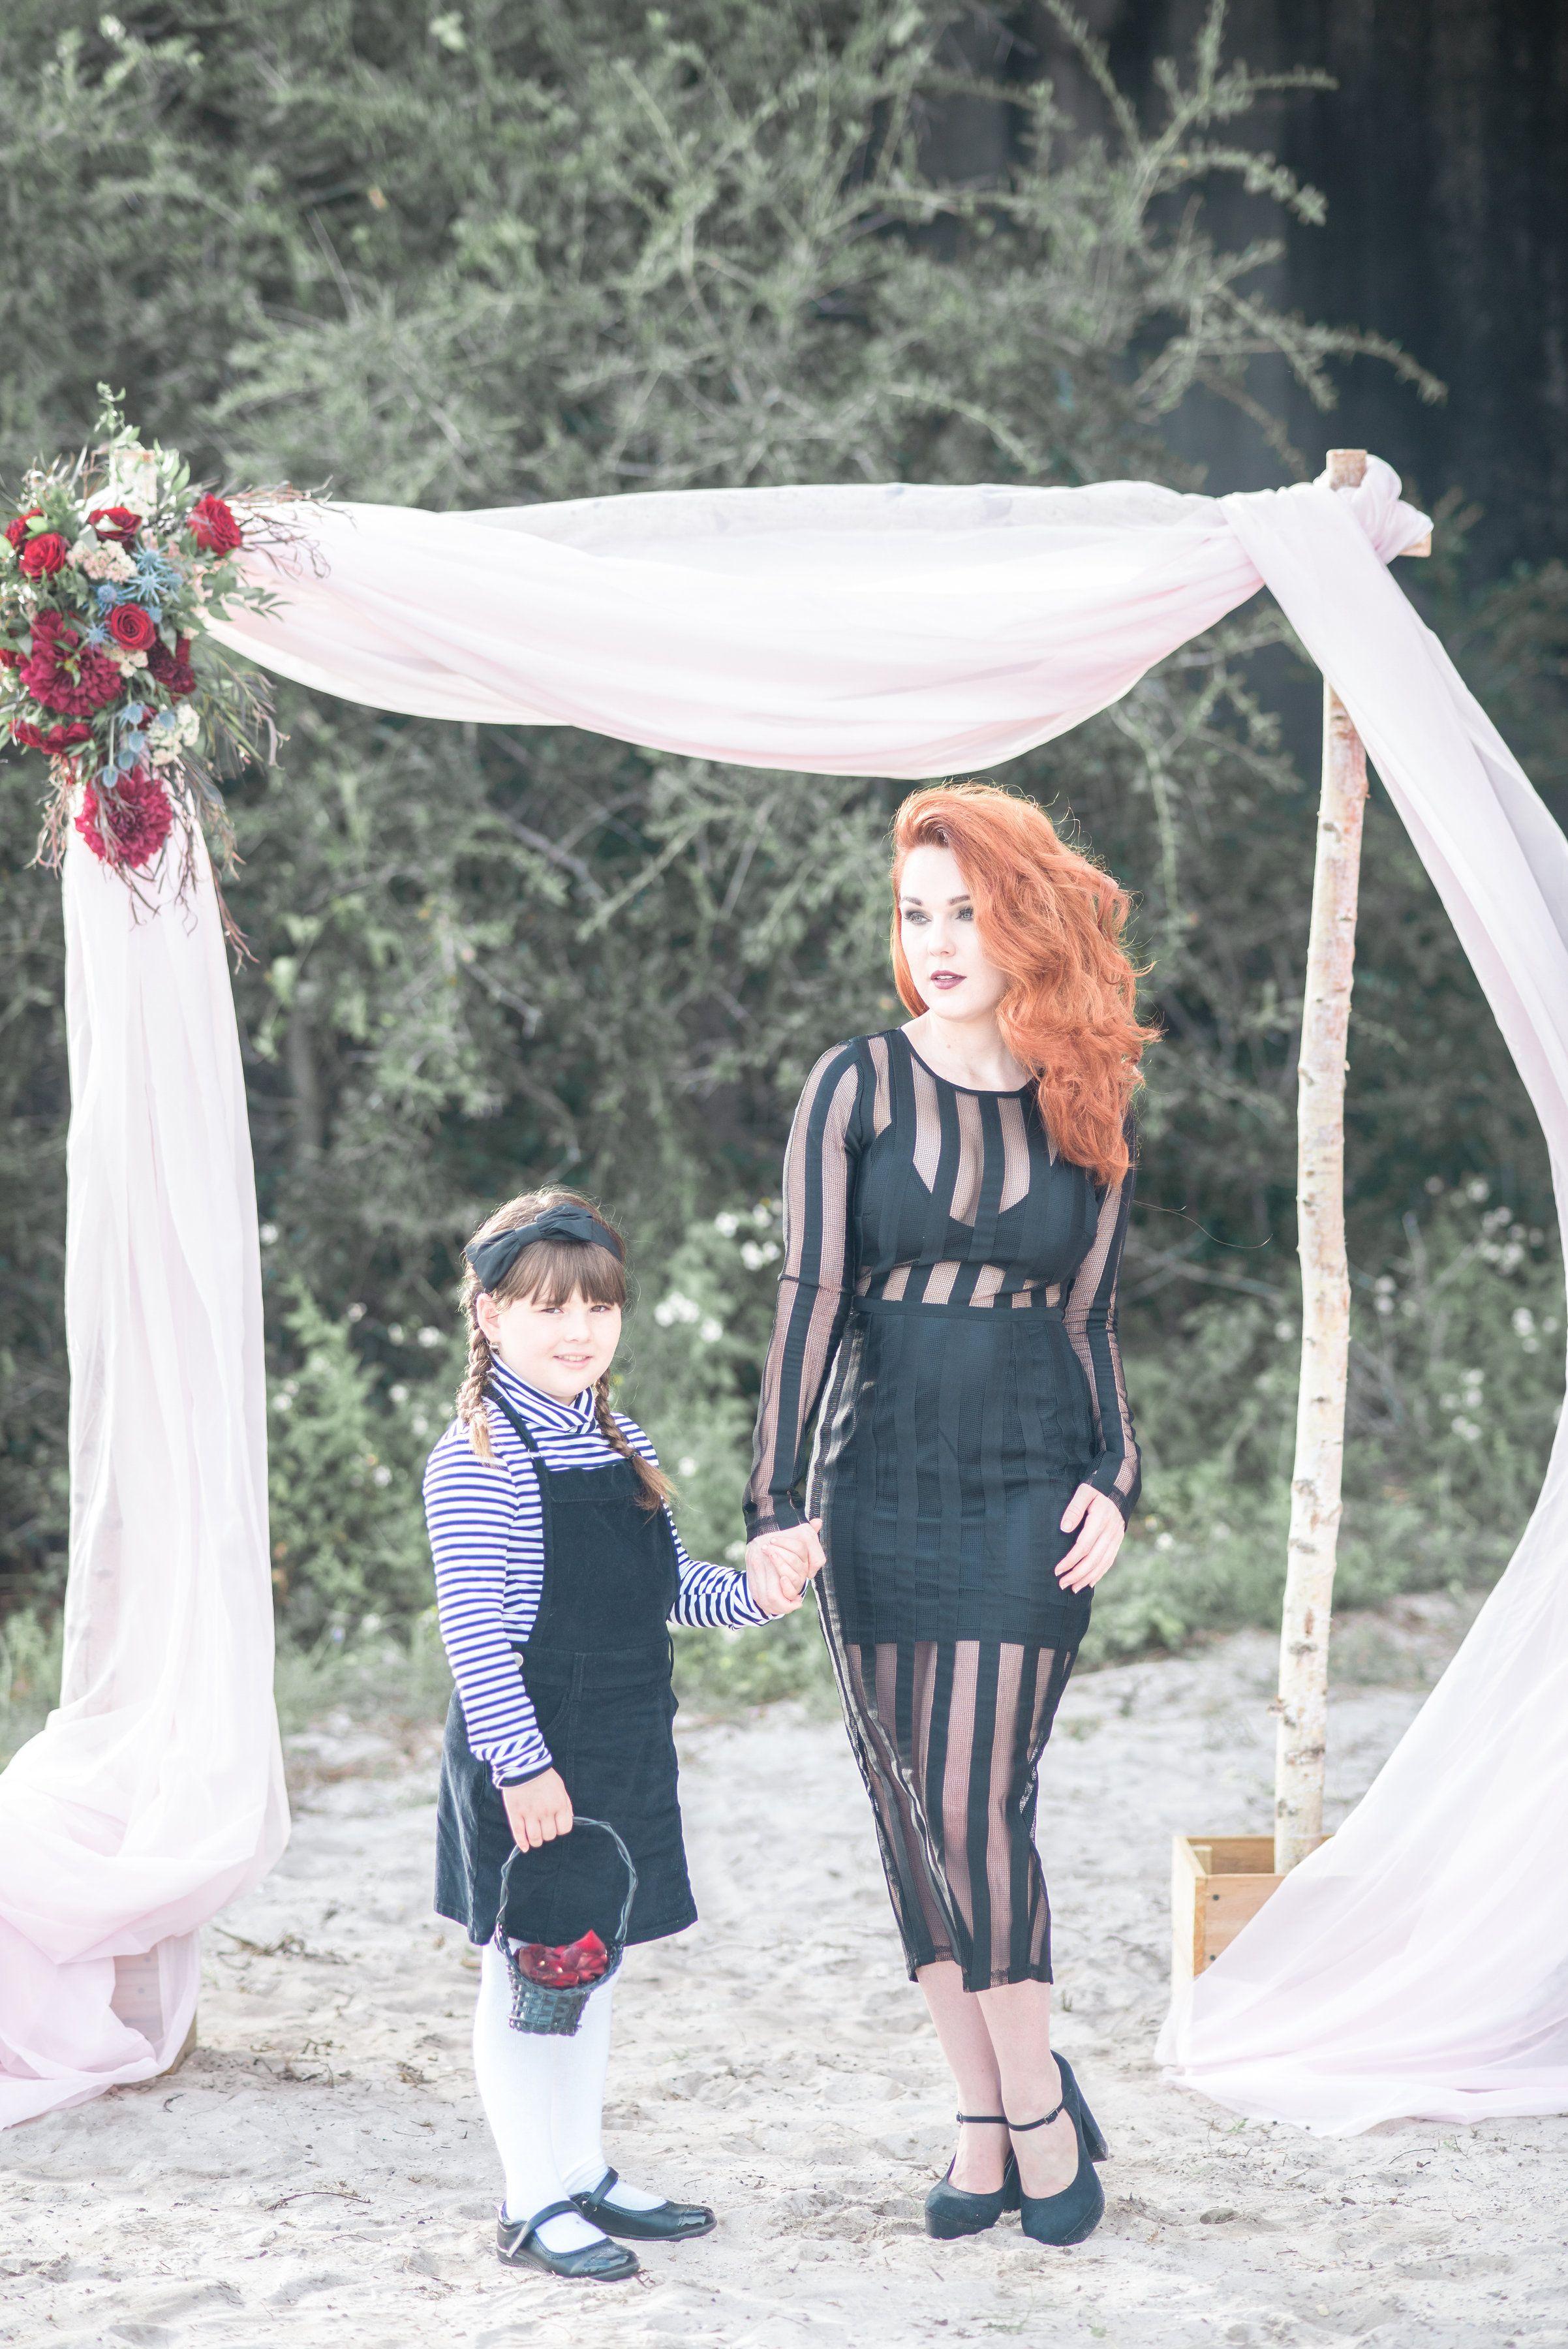 Red and black halloween wedding ideas halloween weddings and weddings